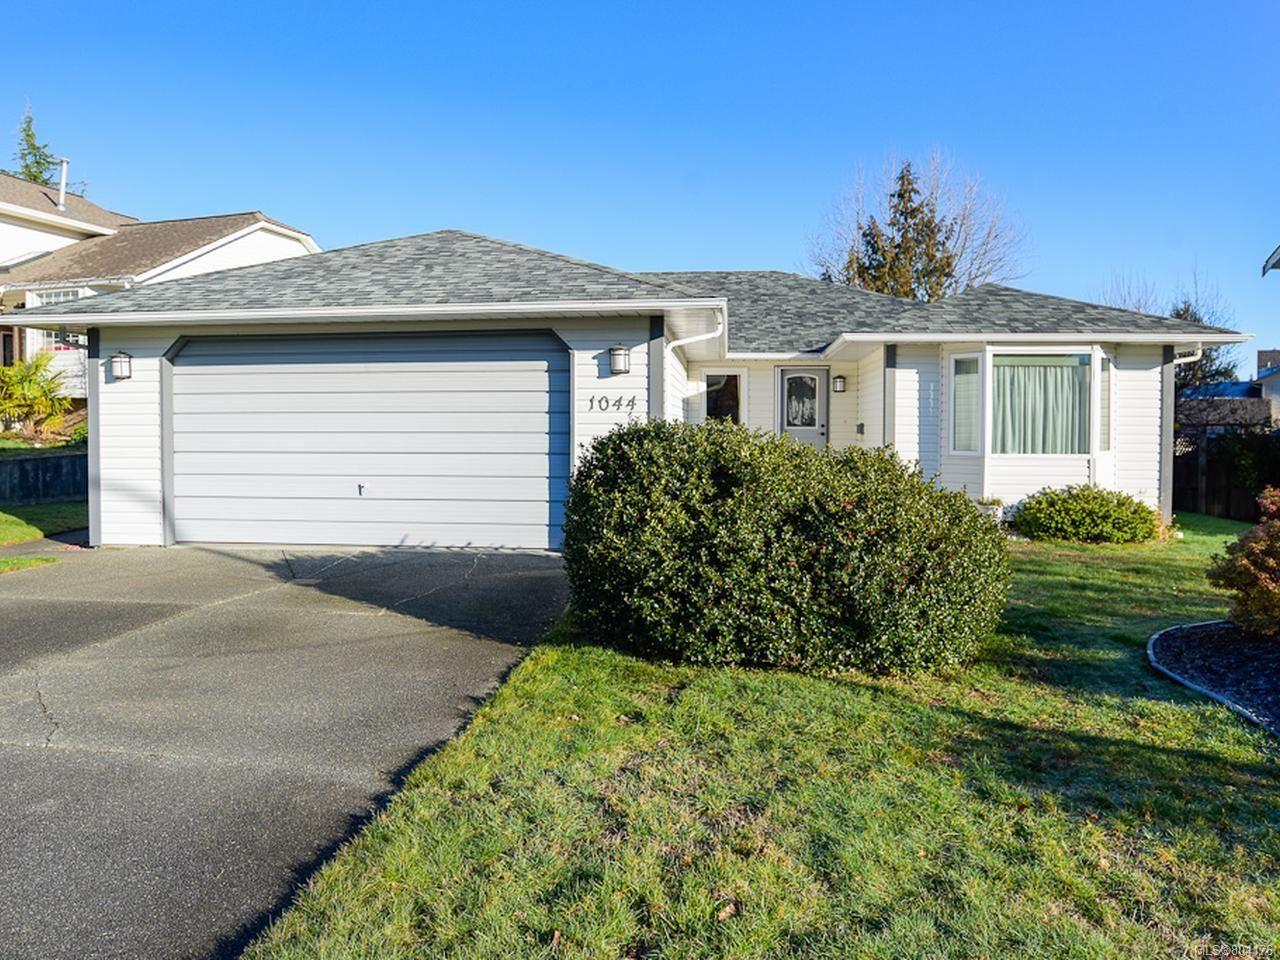 Main Photo: 1044 ARROWSMITH Avenue in COURTENAY: CV Courtenay East House for sale (Comox Valley)  : MLS®# 804176